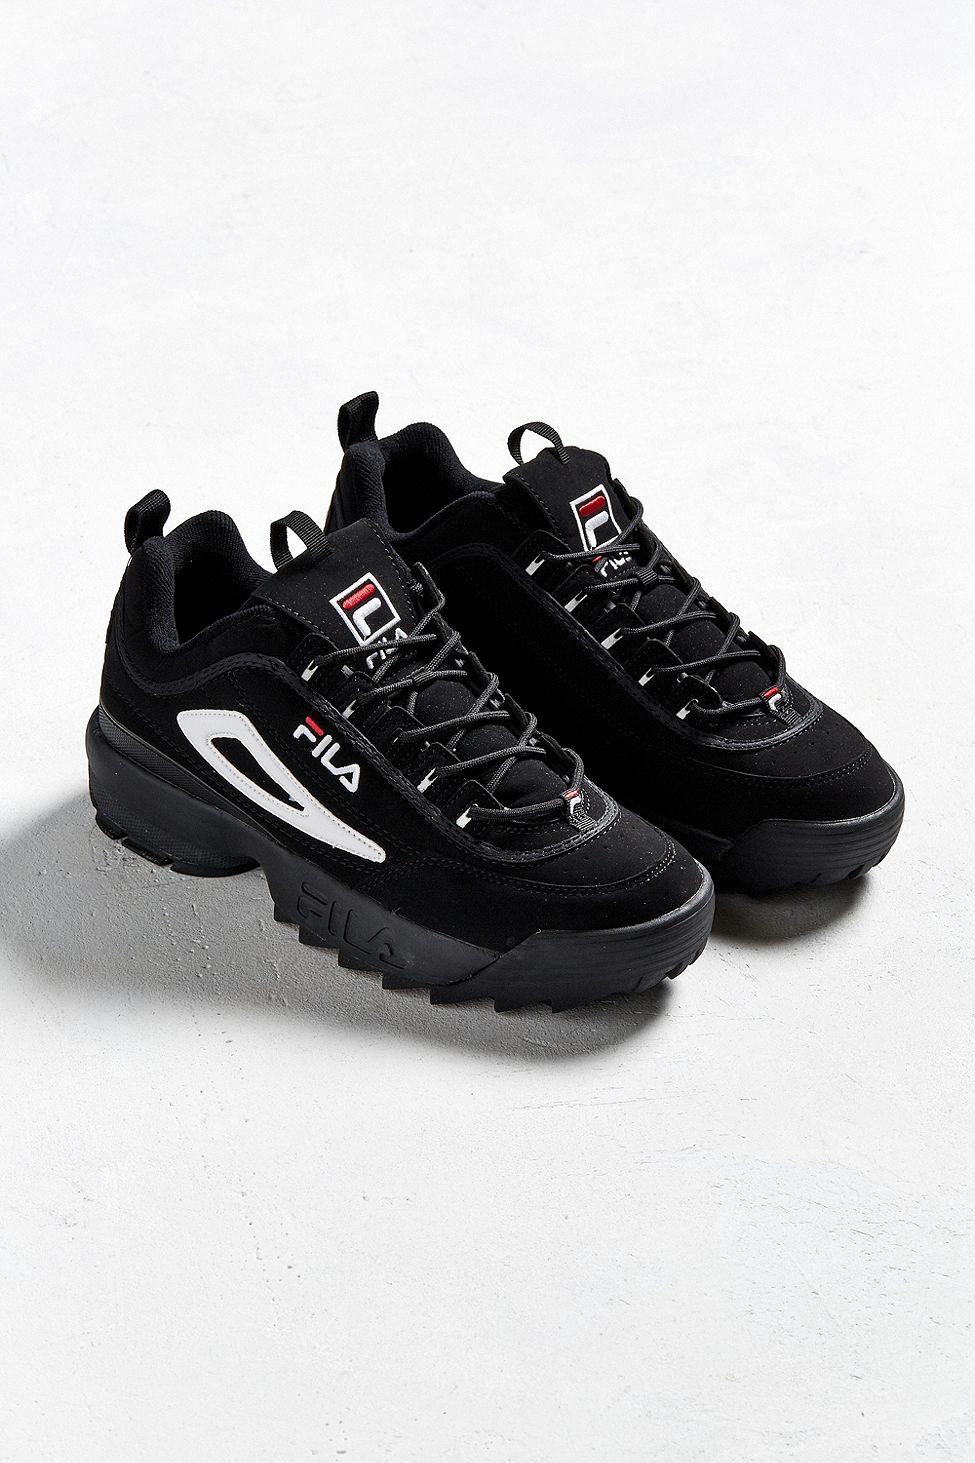 1fc176b85f37 Urban Outfitters Fila Disruptor II Sneaker - Multi 11 One Size